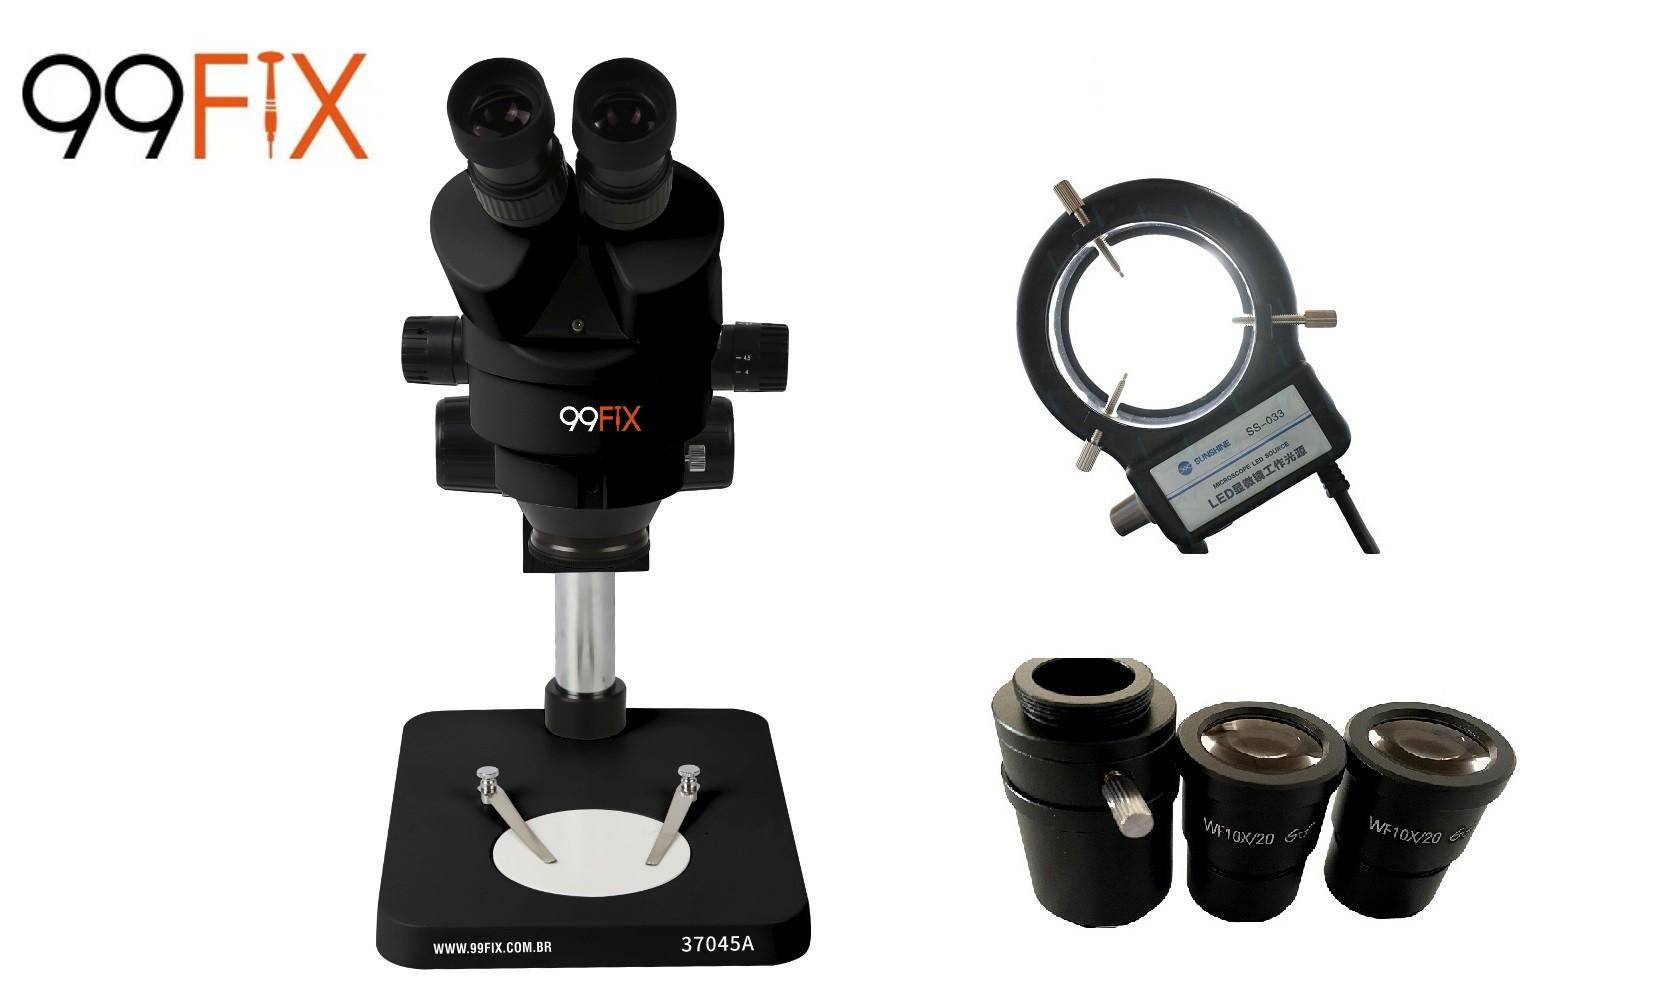 99FIX 37045A MICROSCÓPIO ESTEREOSCÓPICO TRINOCULAR Preto Simul-focal  + Lâmpada de LED SS-033 Preta +NF